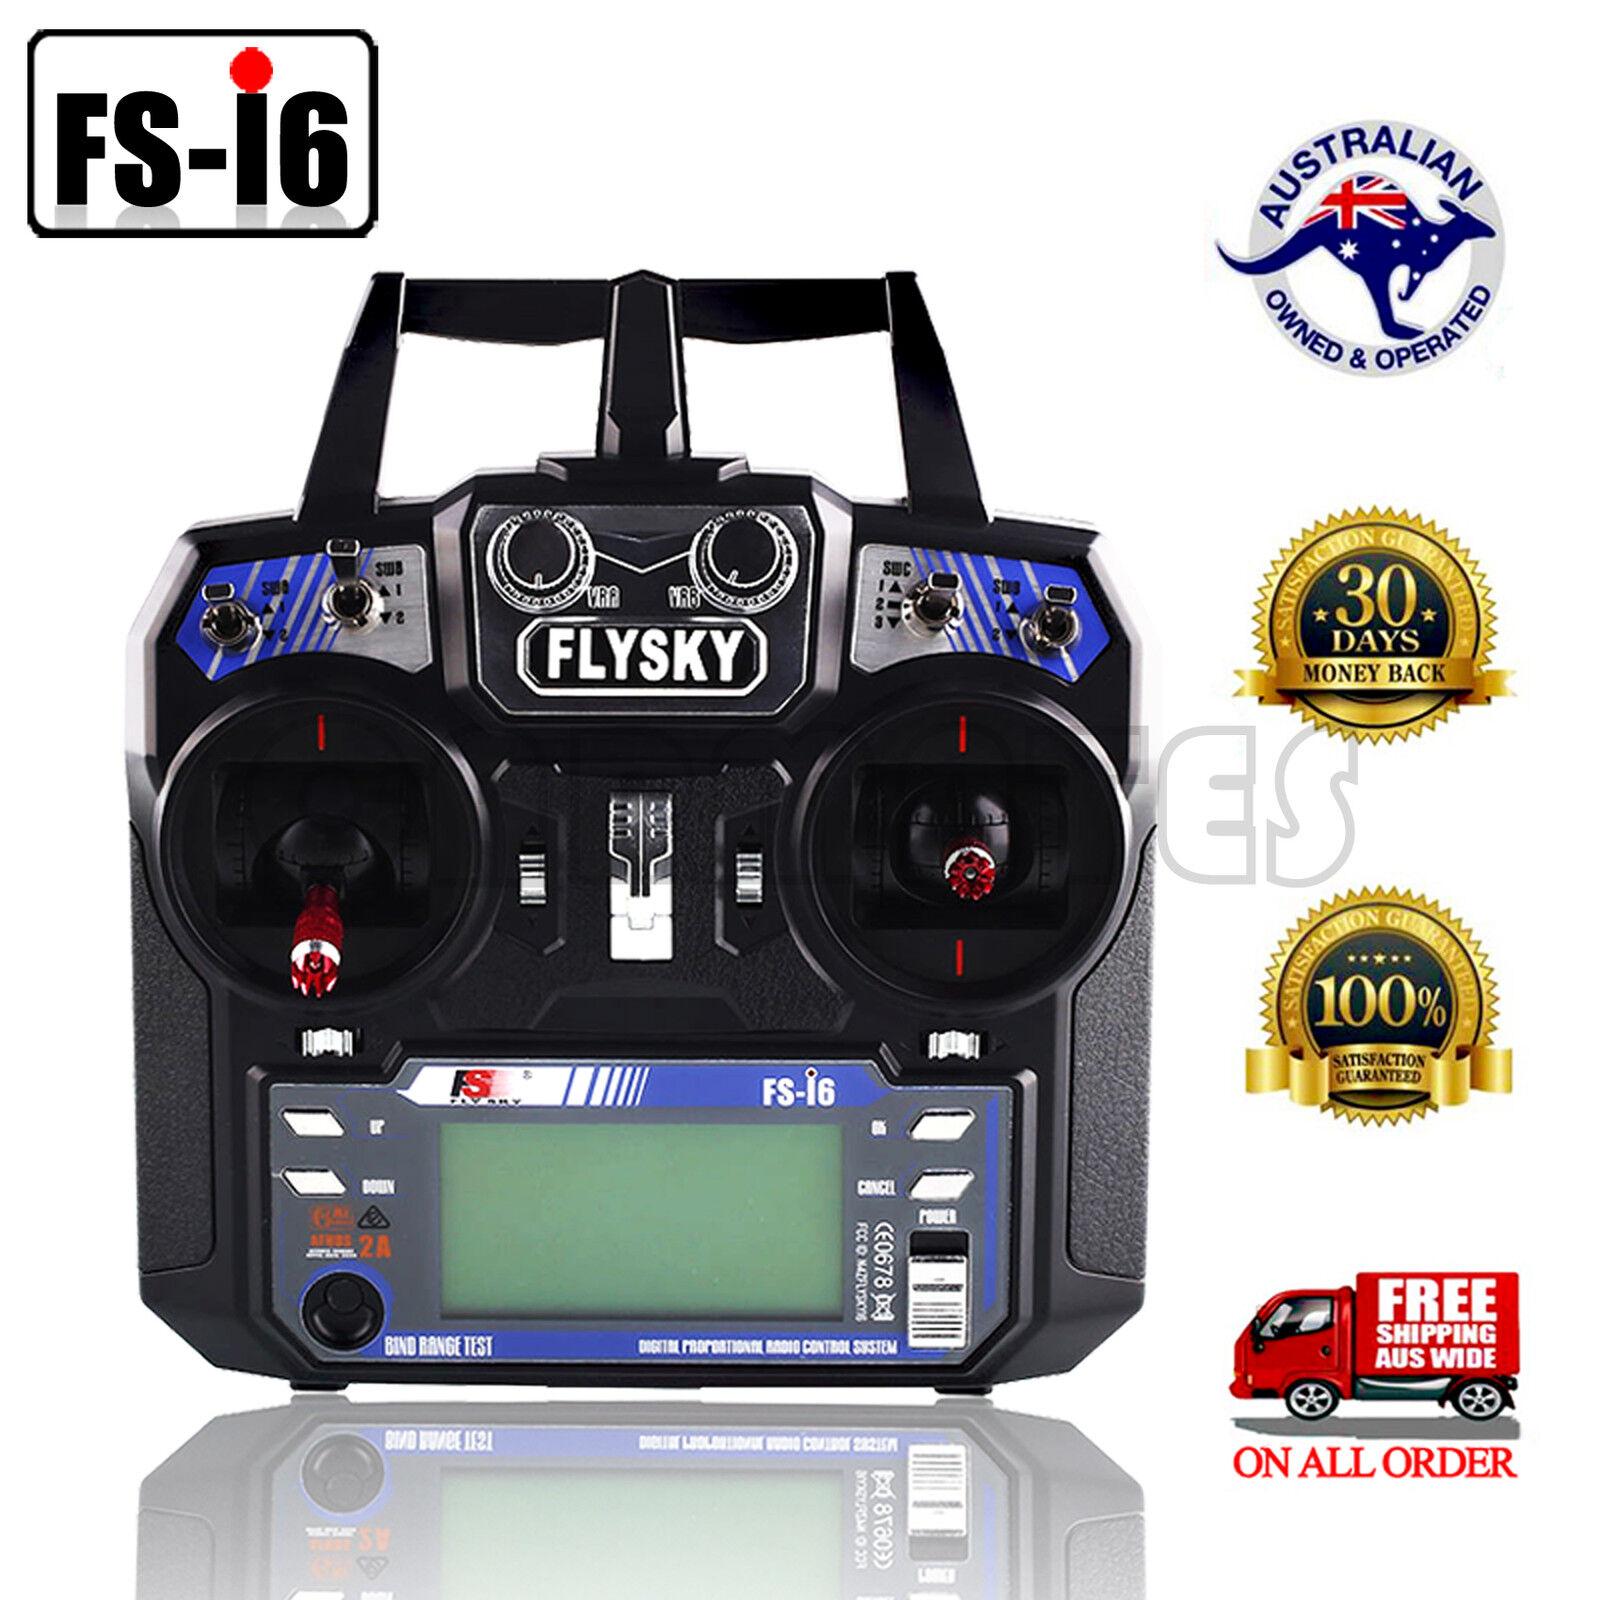 Fs-i6 Flysky 2.4 g 6ch transmisor y receptor para avión RC helicóptero Multicopter